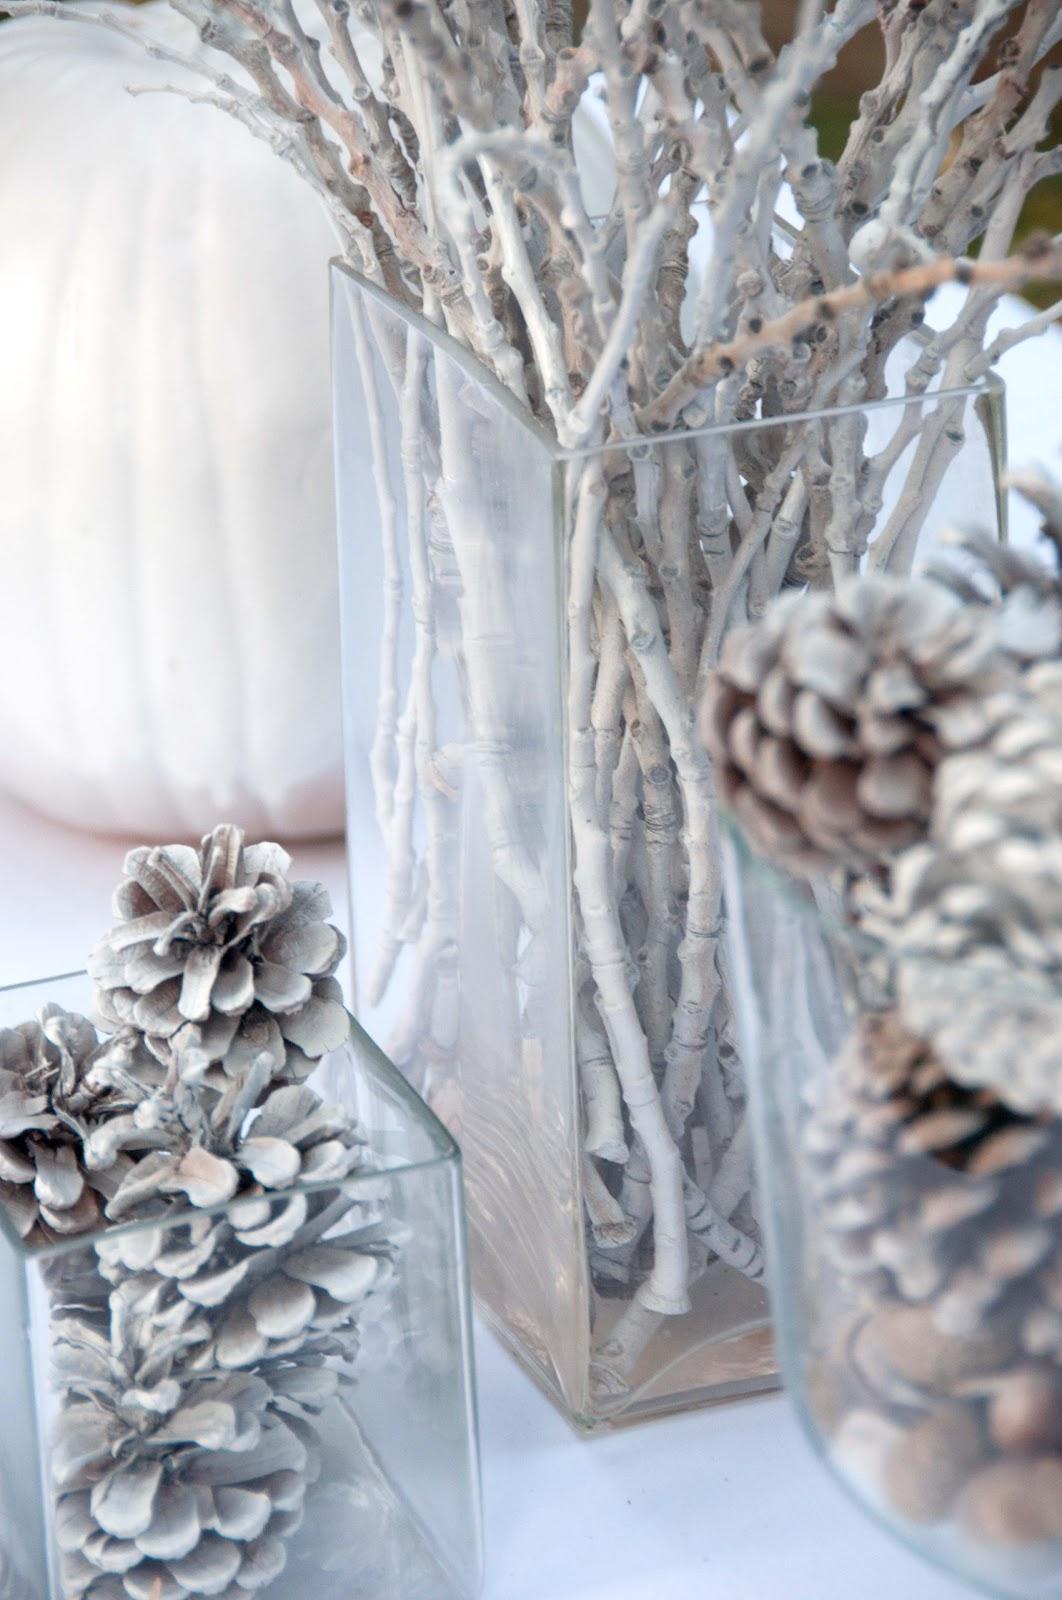 Dreaming of a white Christmas - Nějaké šišky už mám z loňska připravené...